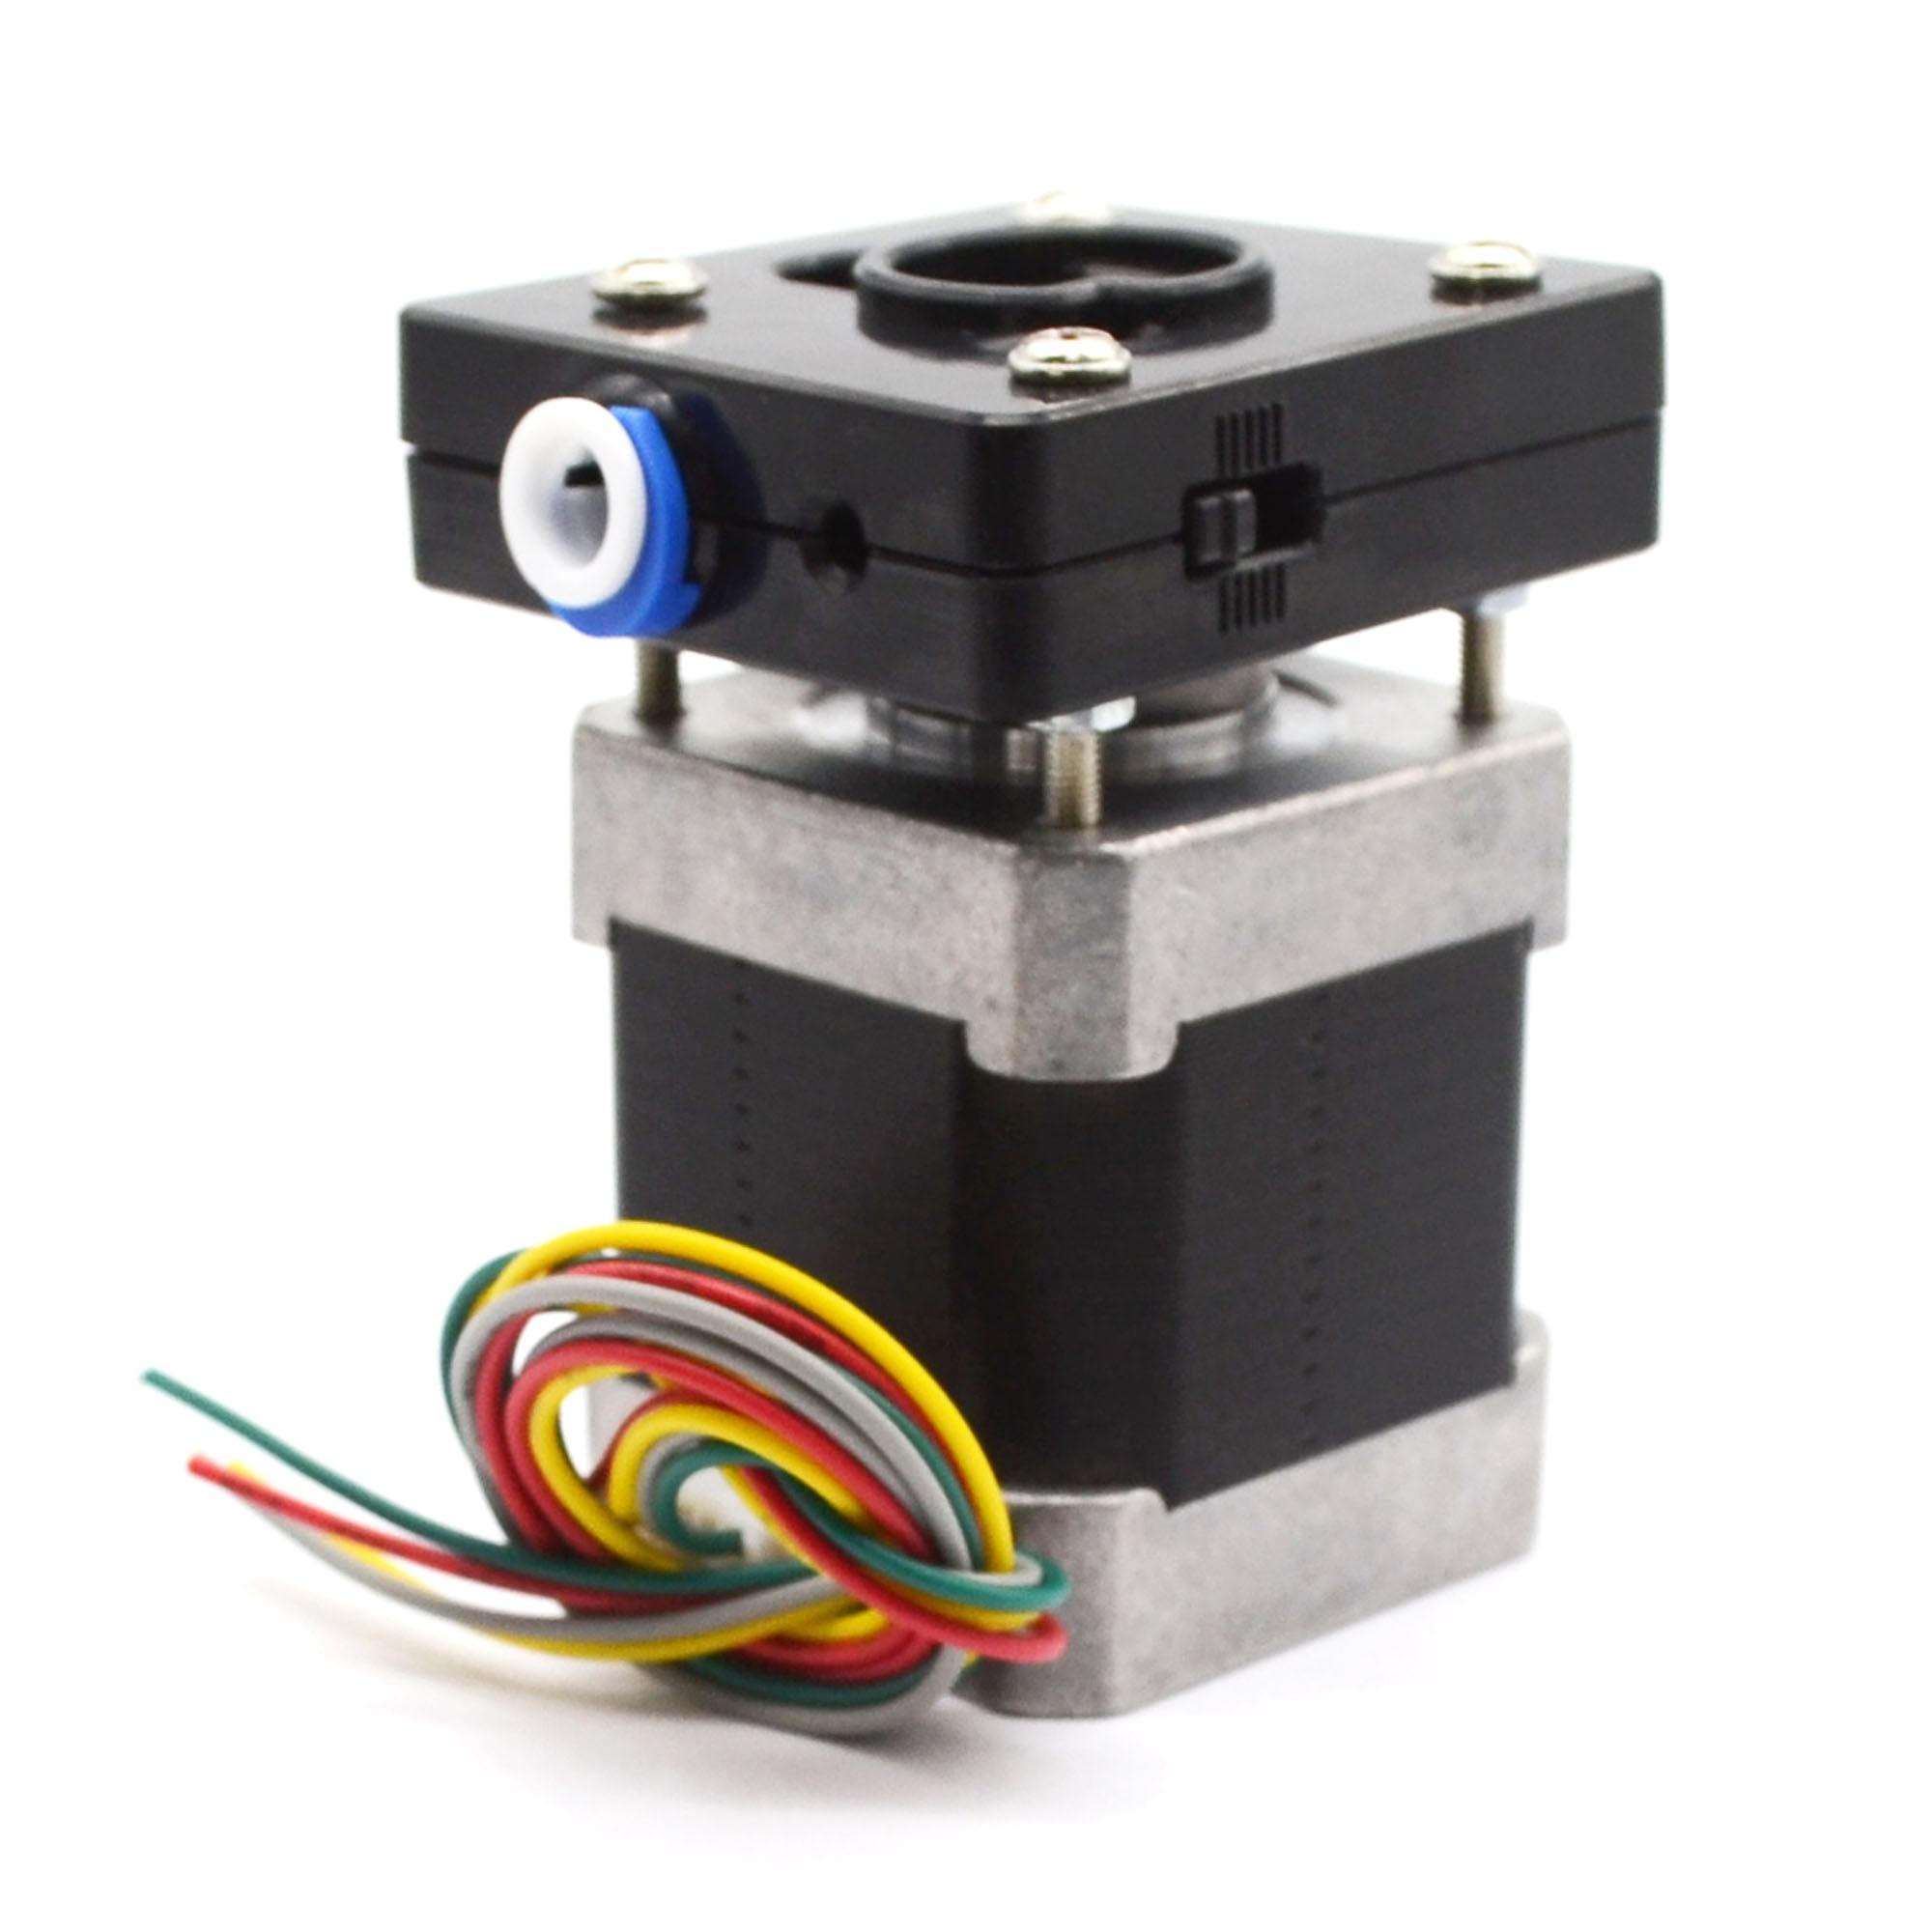 3D Printer Ultimaker 2 Bowden Extruder Feeder device with Nema 17 stepper motor For 1.75mm/3.0mm Filament UM2 Remote extruder gt2560 3d printer controller board atmega2560 ramps1 4 ultimaker prusa with a4988 stepper driver support dual extruder power